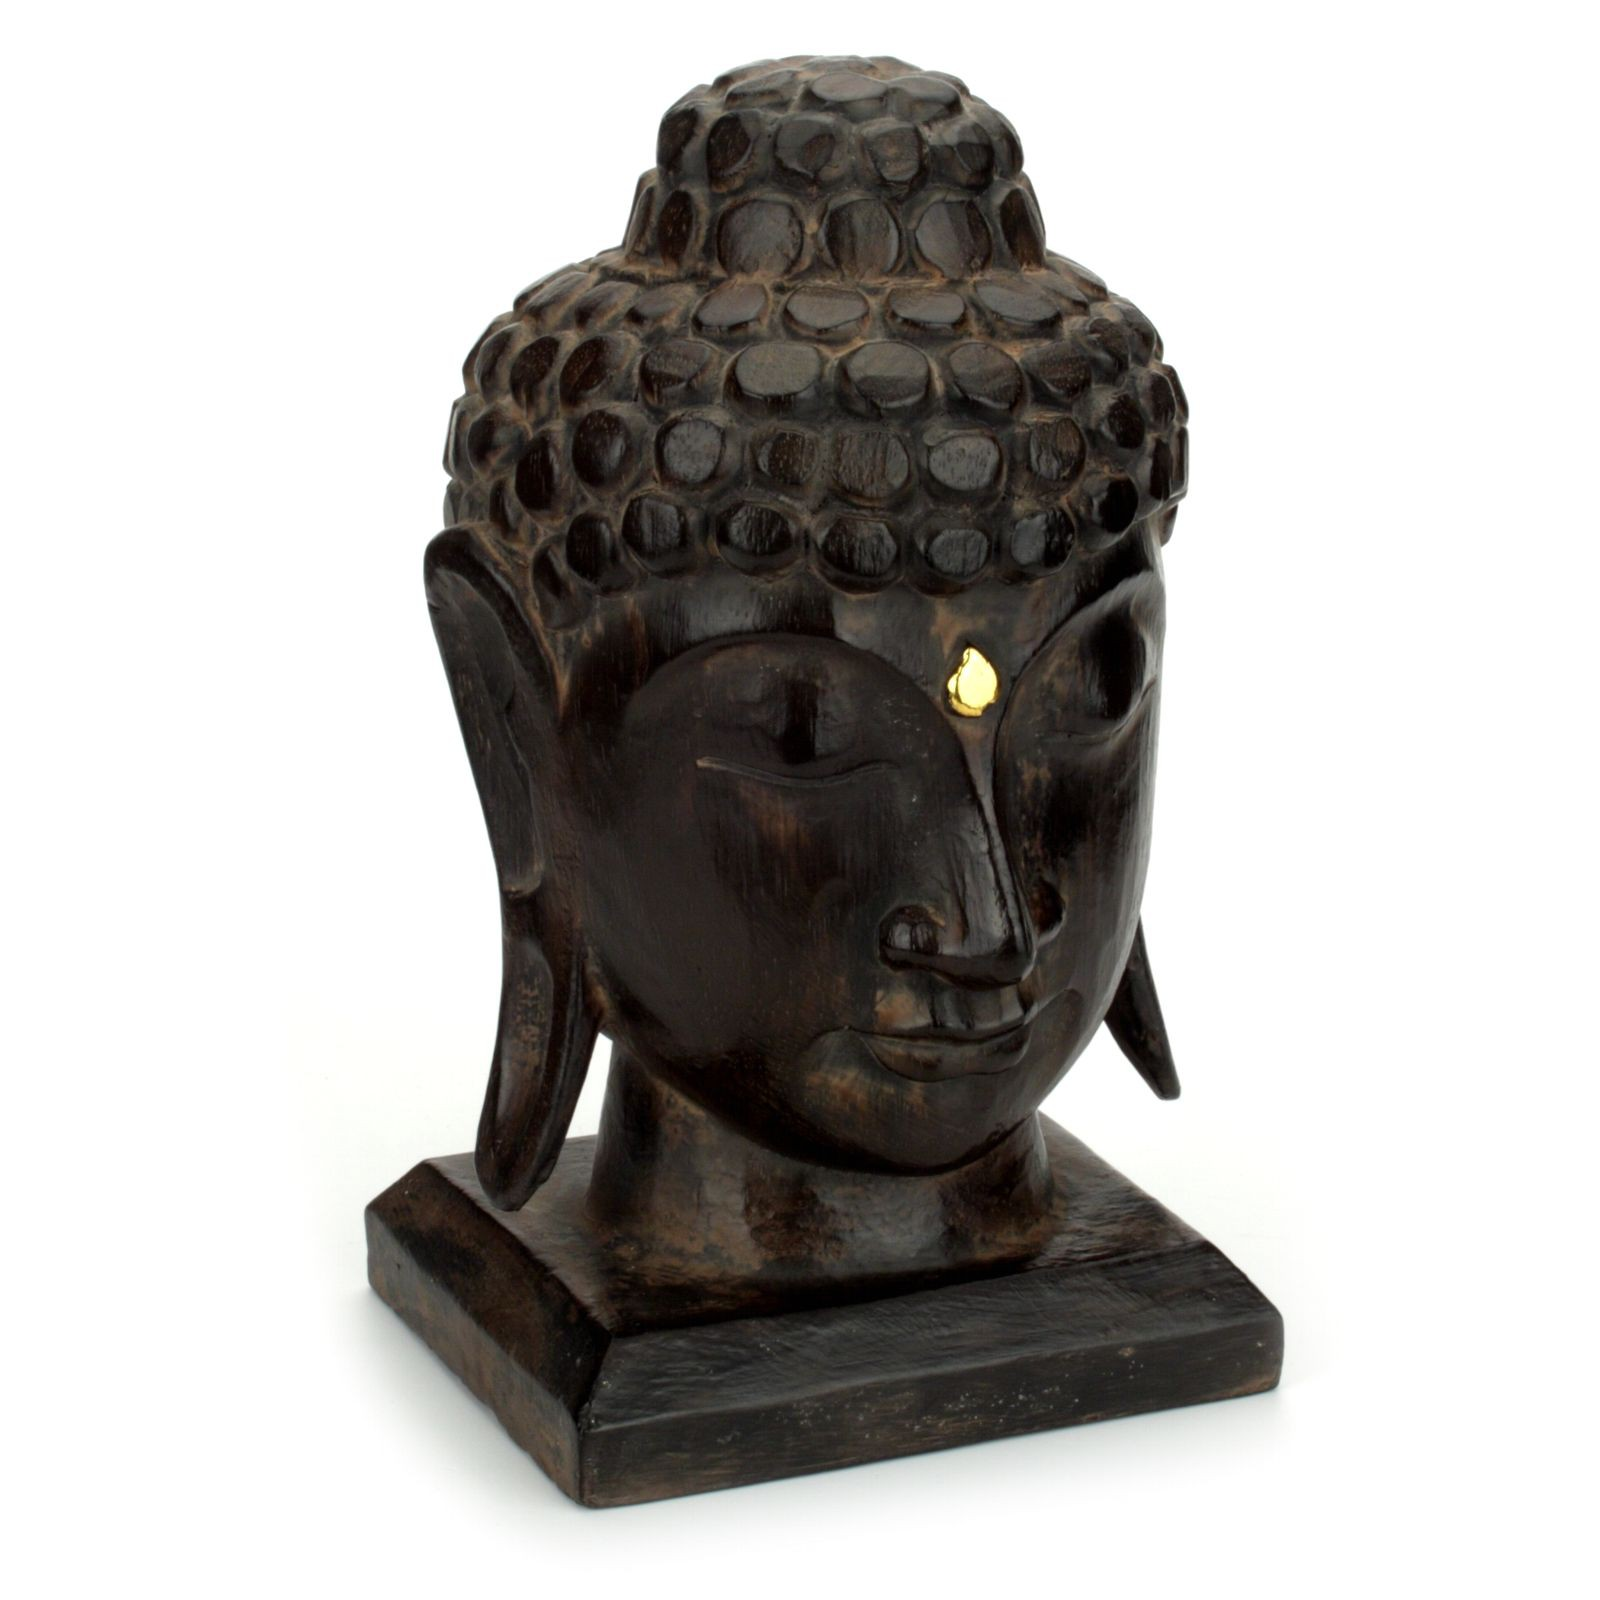 Buddha kopf figur aus holz gr s 25 cm ebenholzfarben for Buddha figur holz